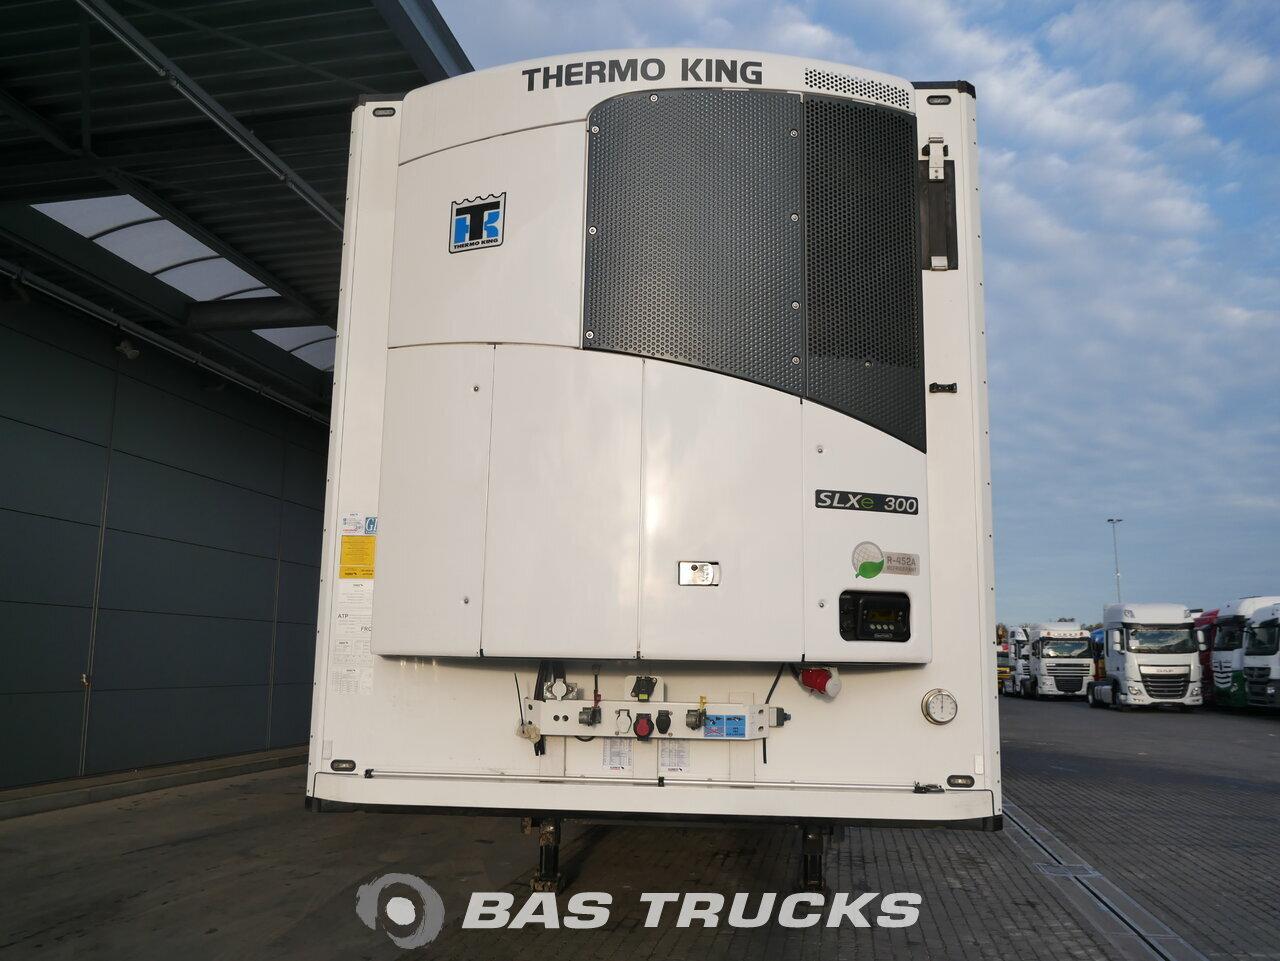 foto di Usato Semirimorchio Schmitz Blumenbreit Thermoking SLX-300 2025 Hours SCB*S3B assi 2016